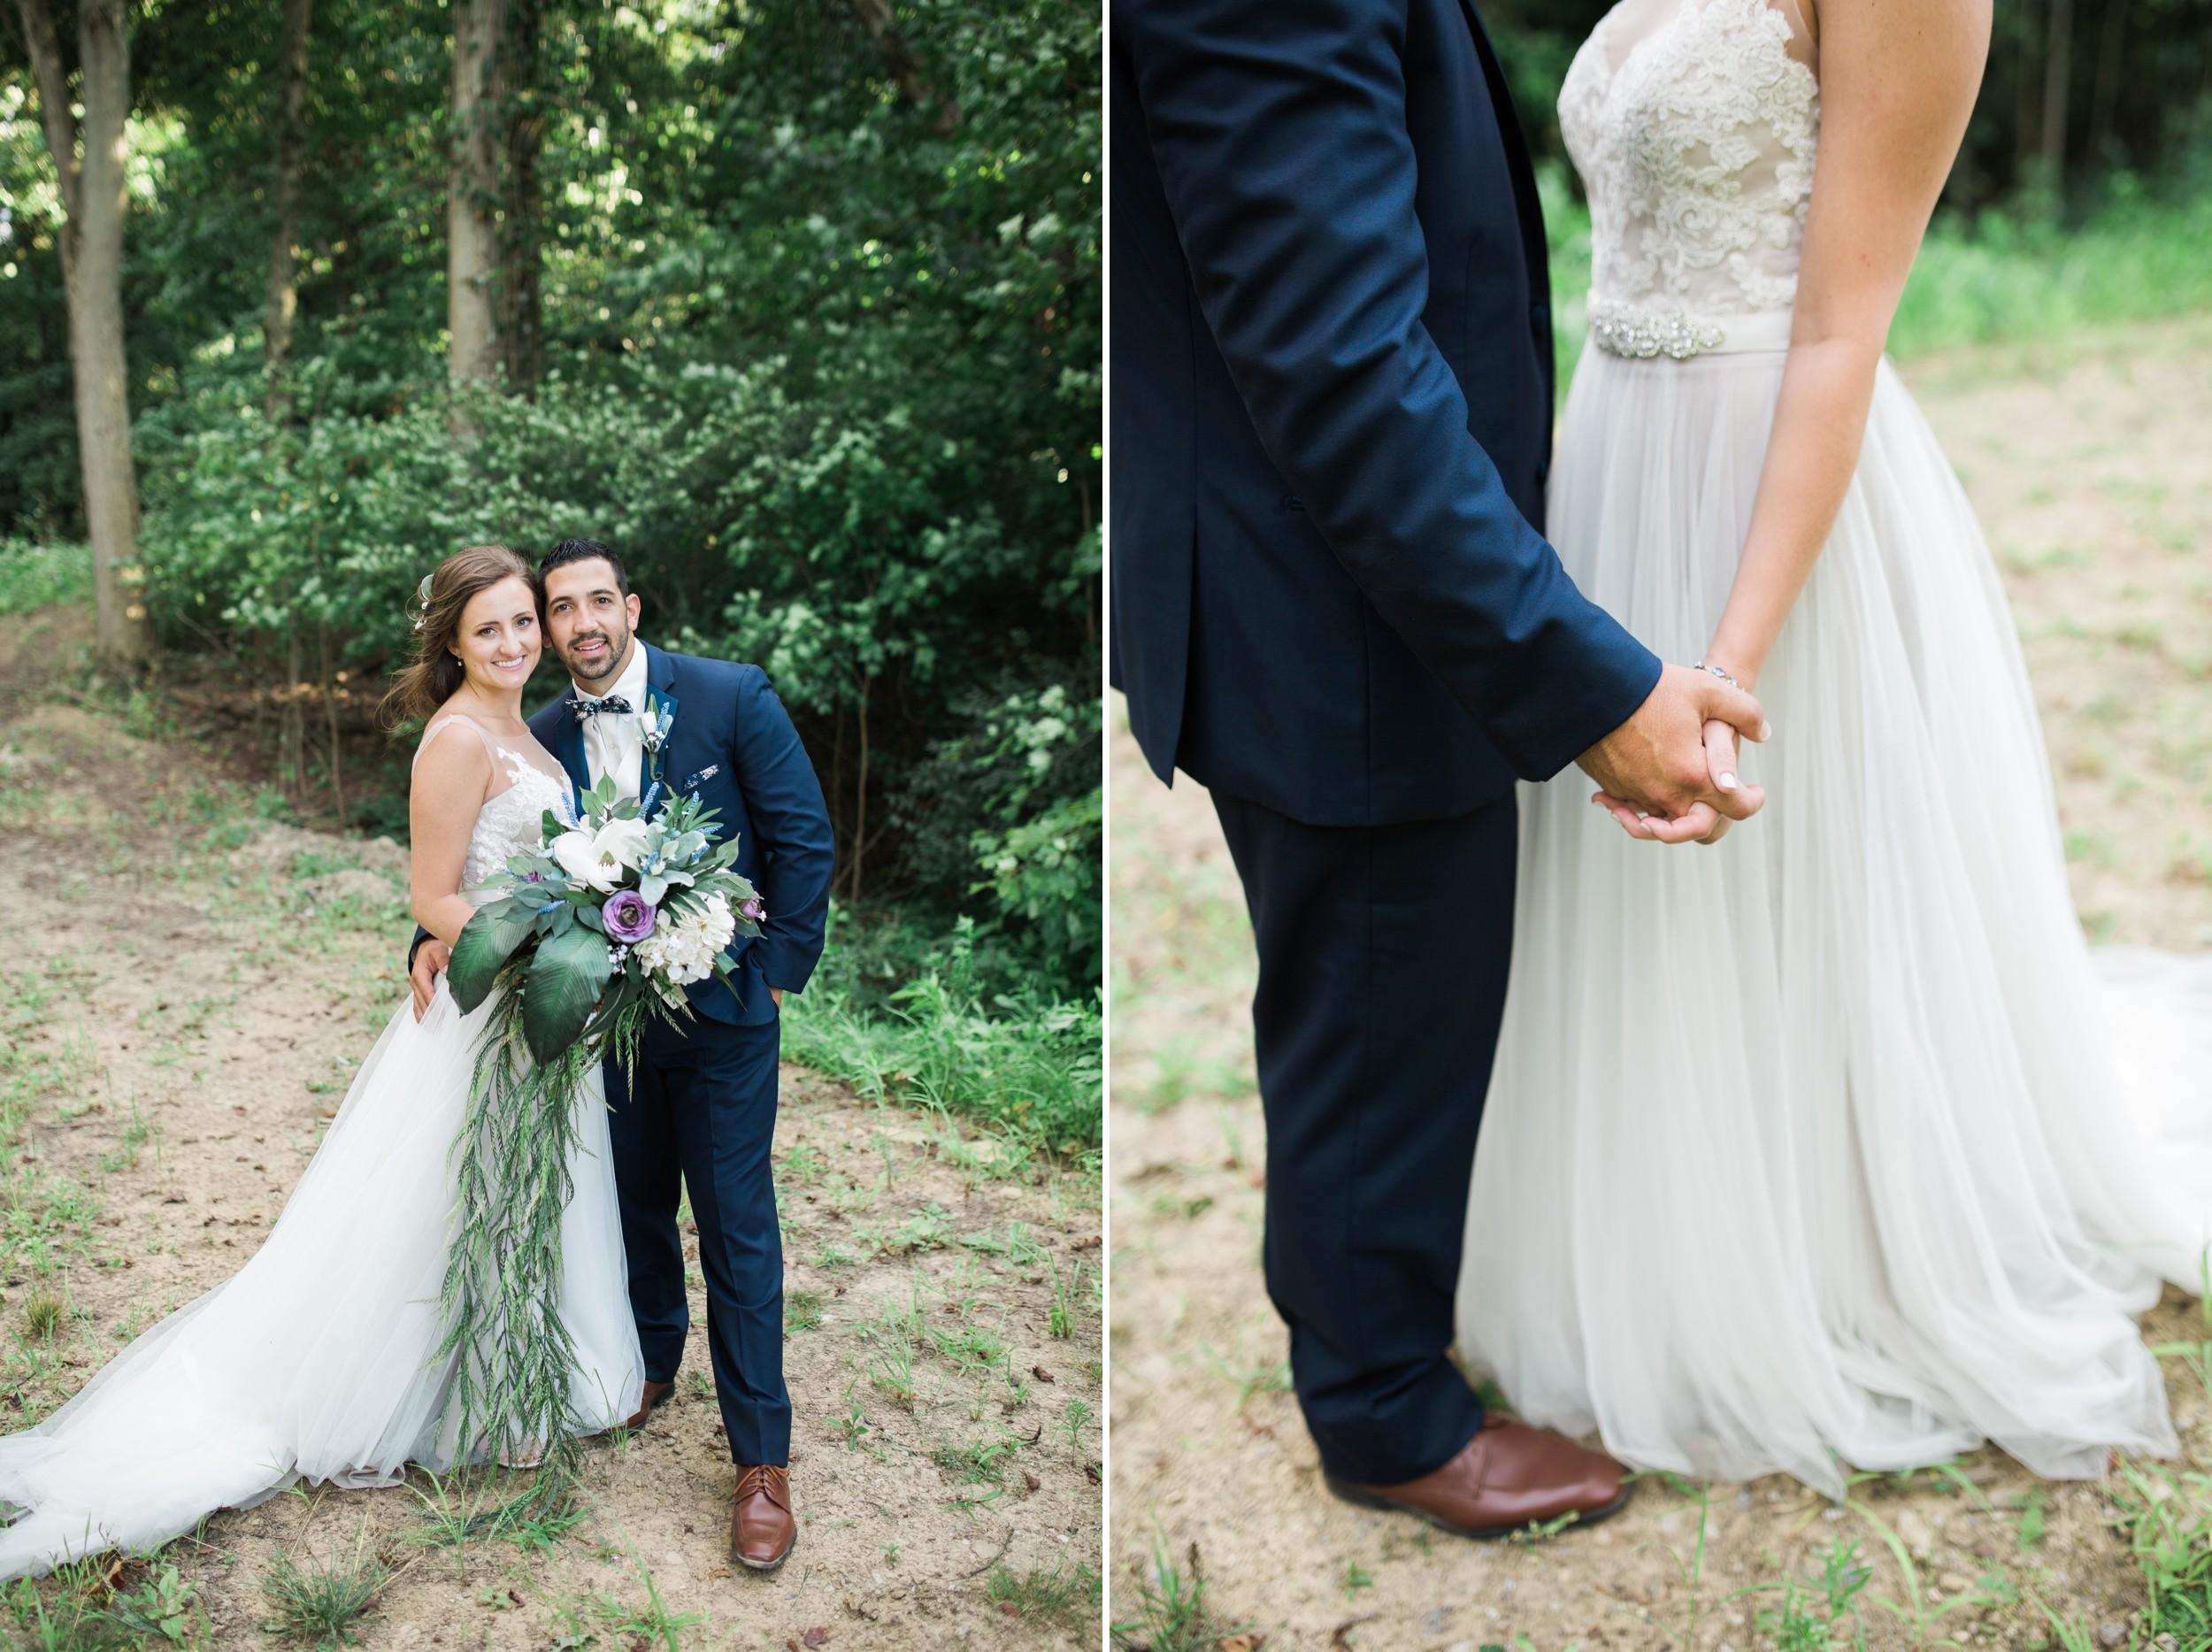 Nick-and-martina-pinelake-vinyards-wedding-columbiana-ohio-tracylynn-photography 22.jpg